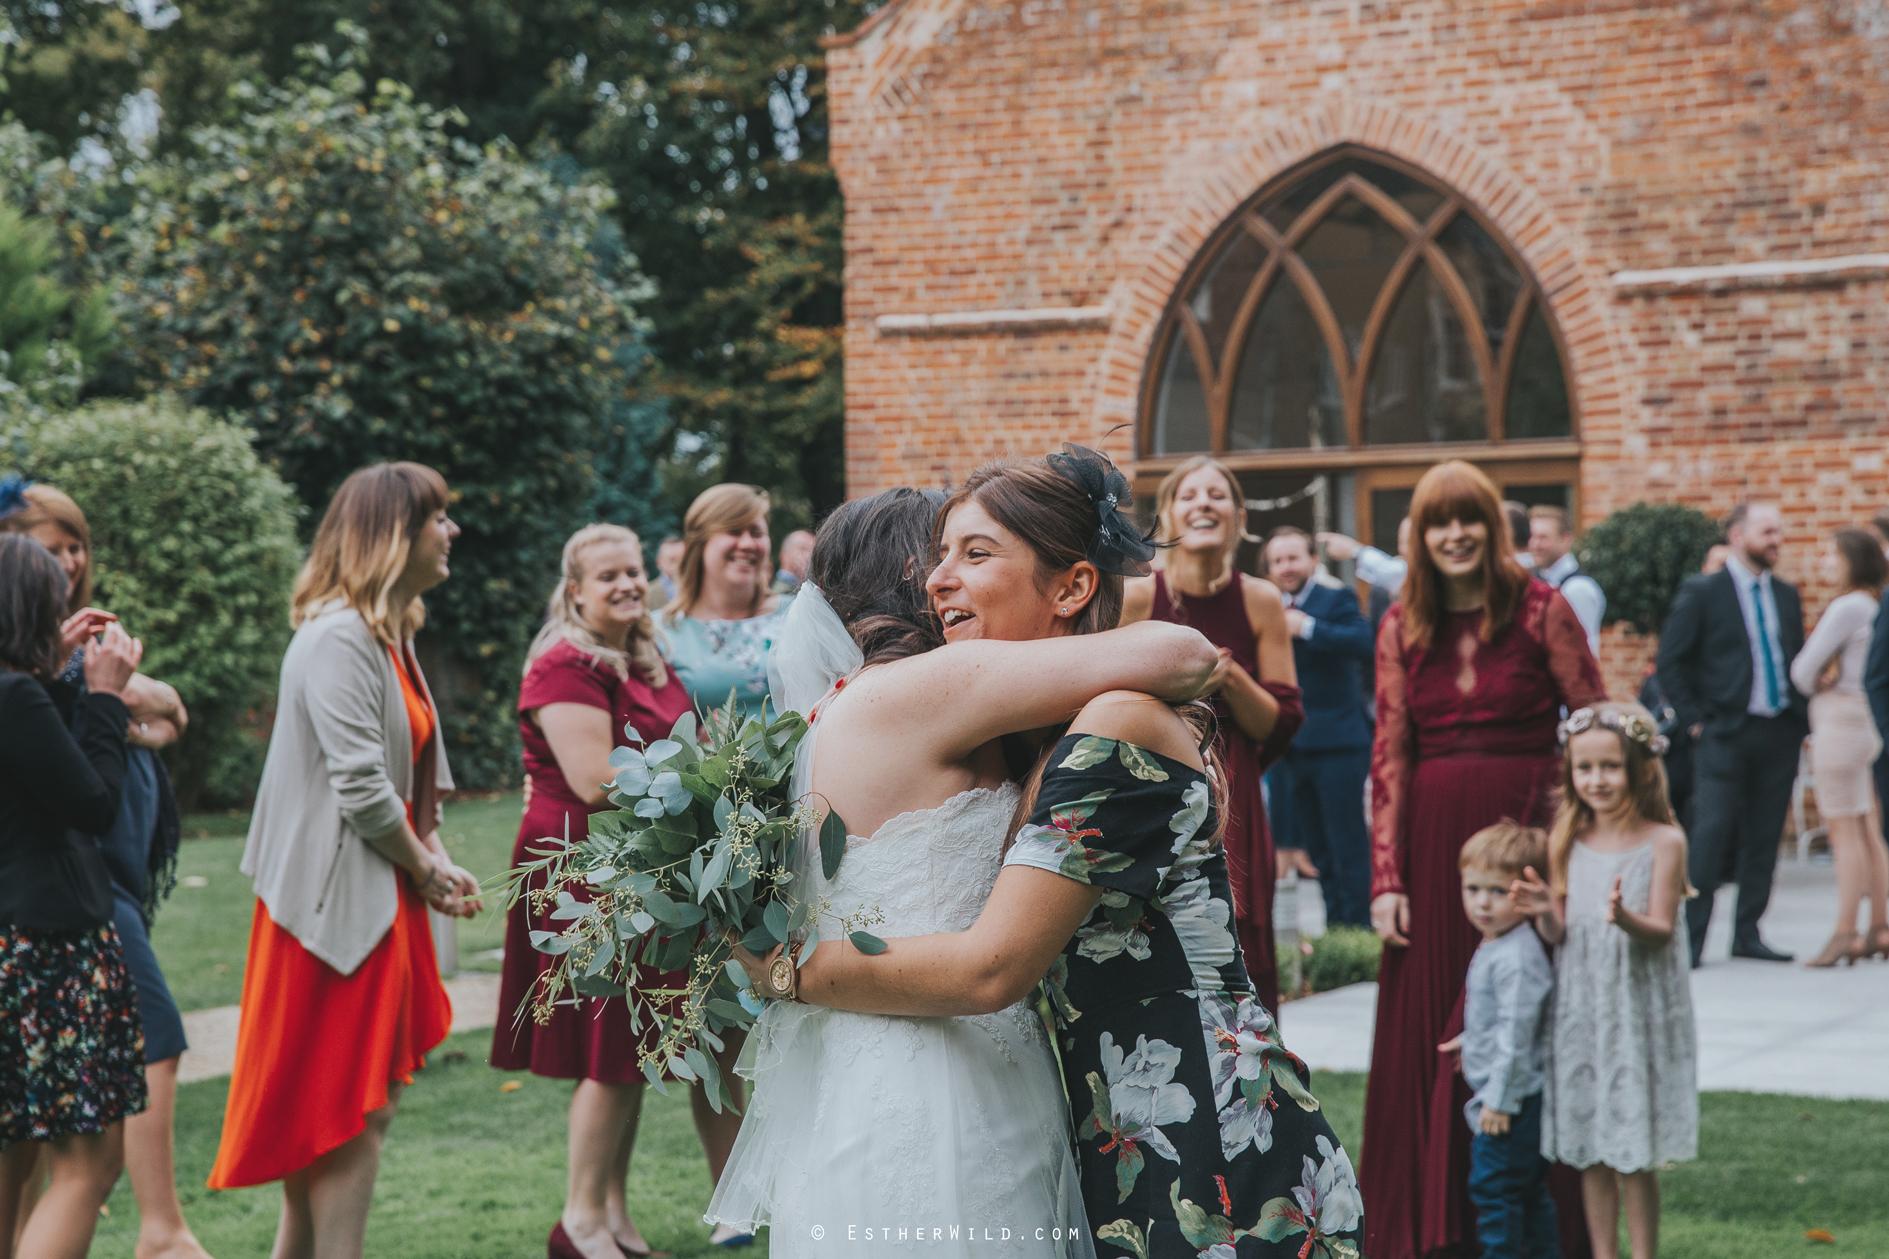 Reading_Room_Weddings_Alby_Norwich_Photographer_Esther_Wild_IMG_1641.jpg